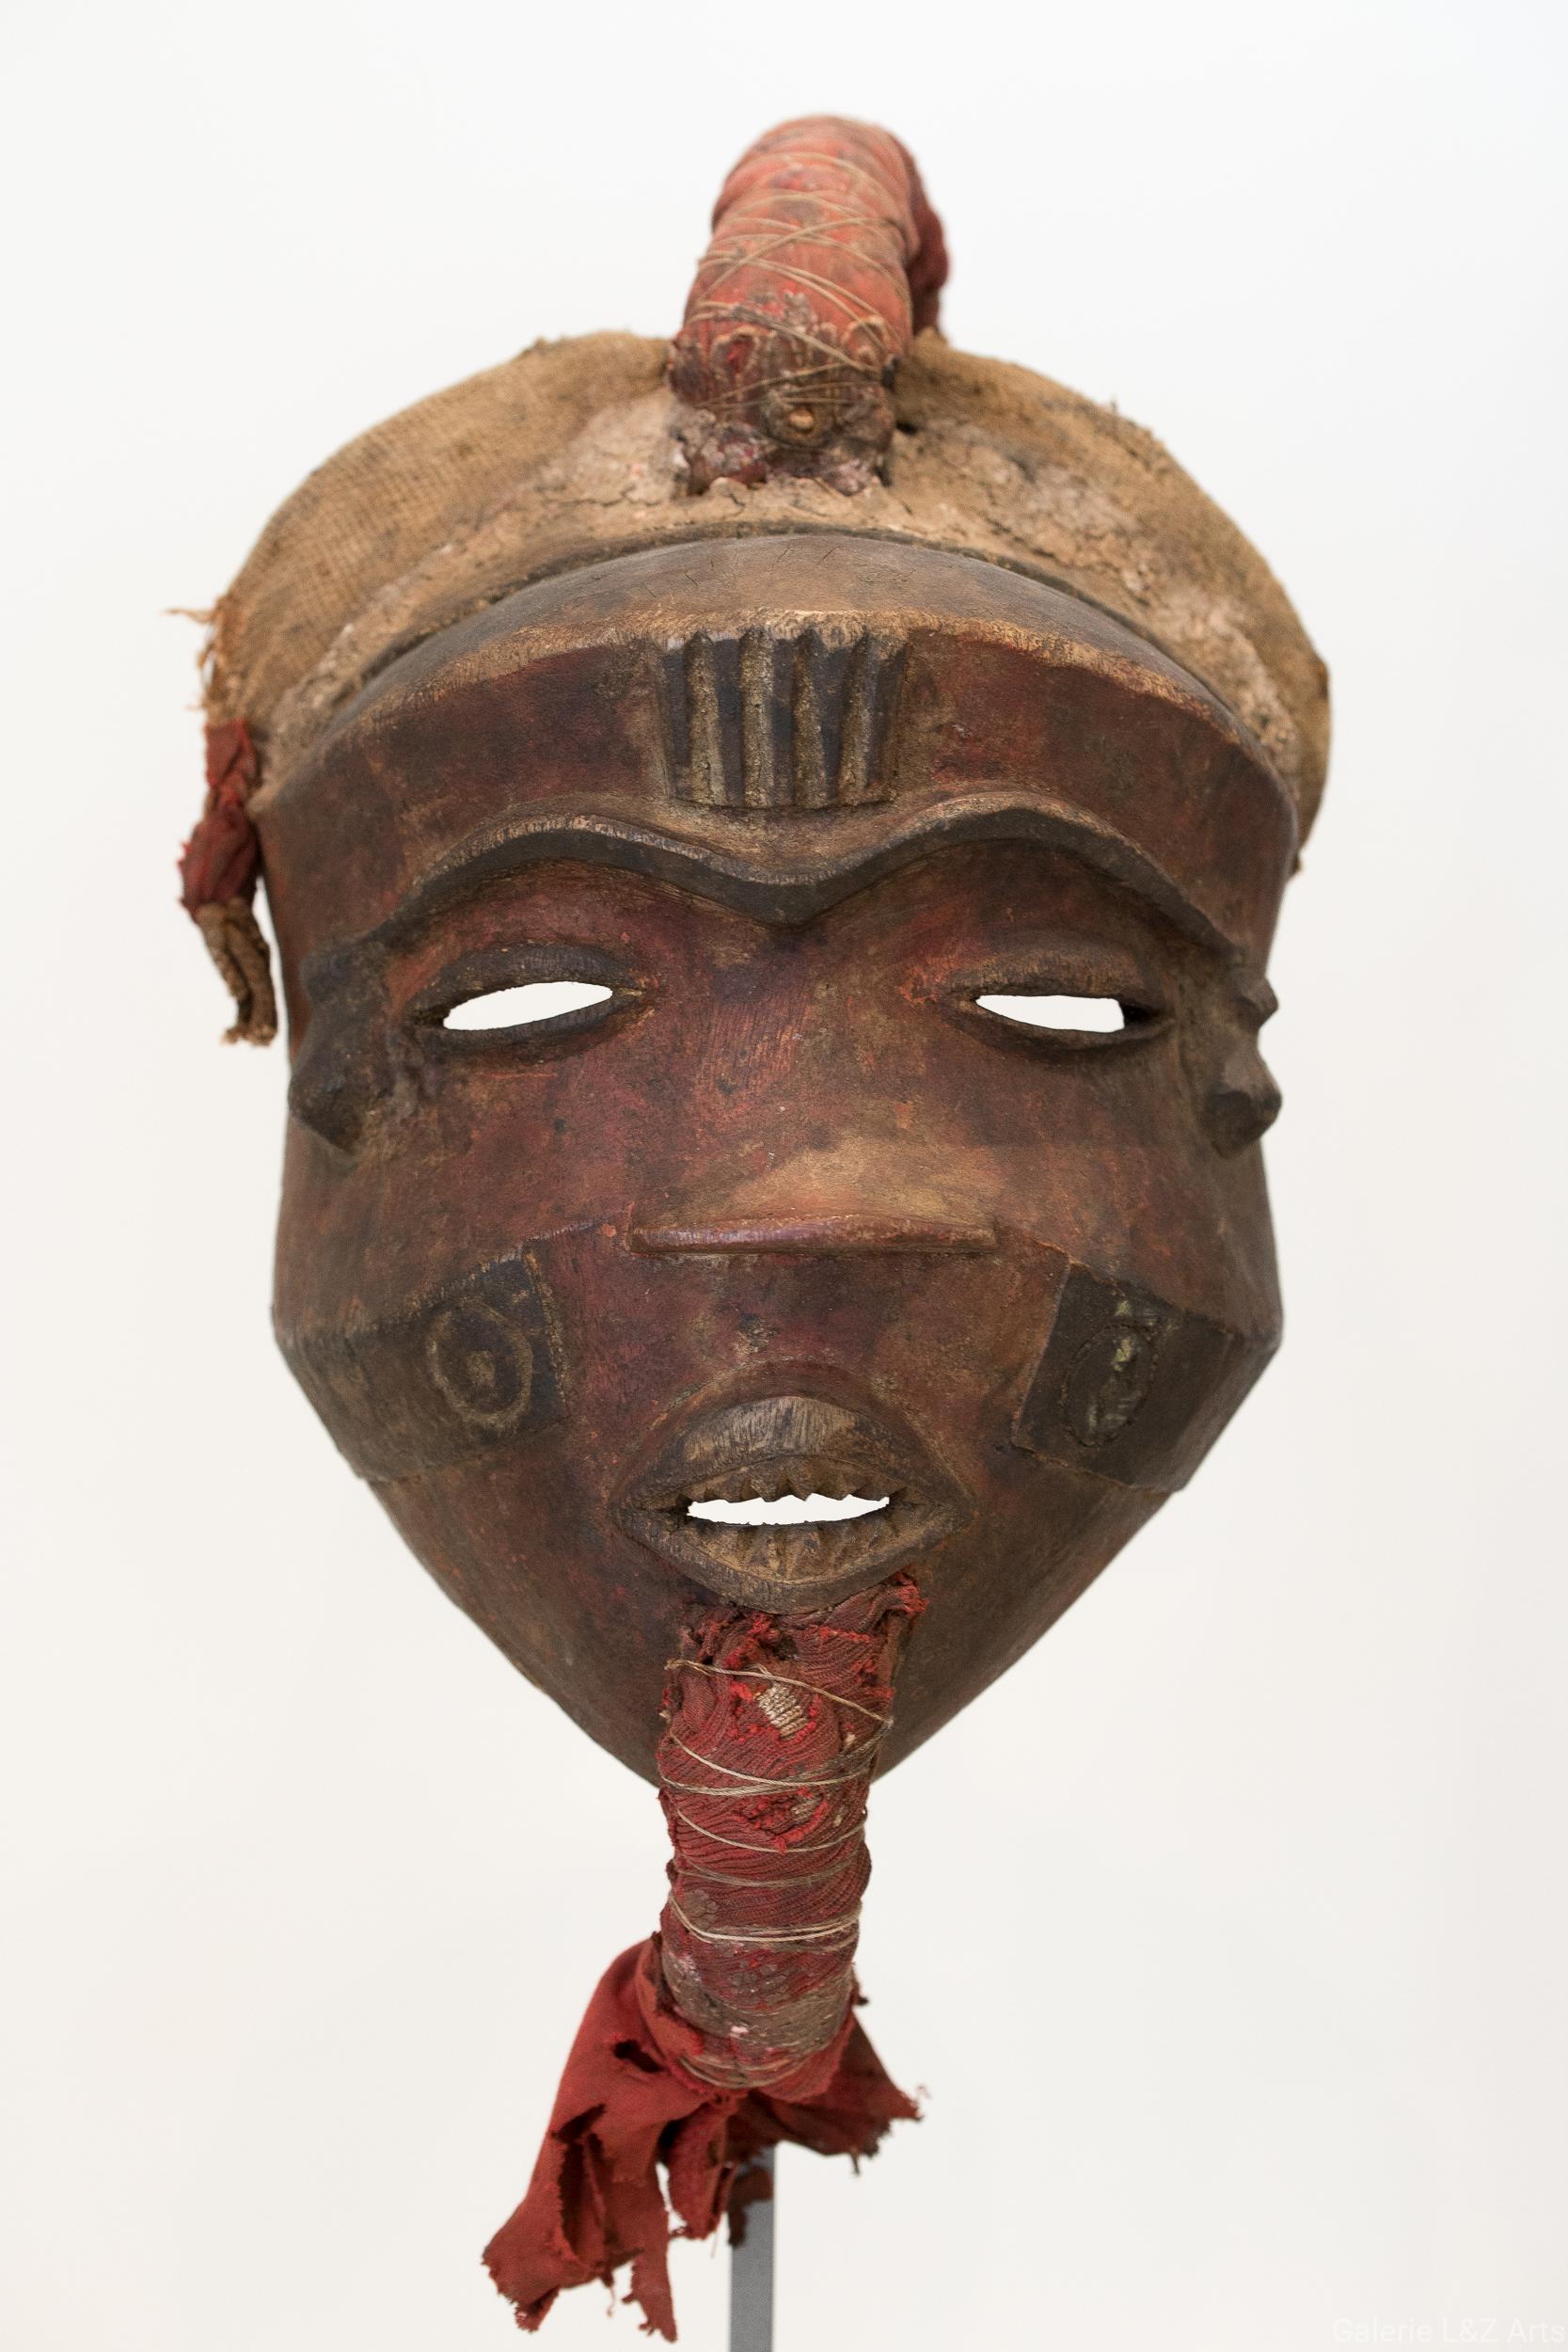 tribal-art-oostende-ostende-exposition-galerie-lz-art-africain-belgique-10.jpg